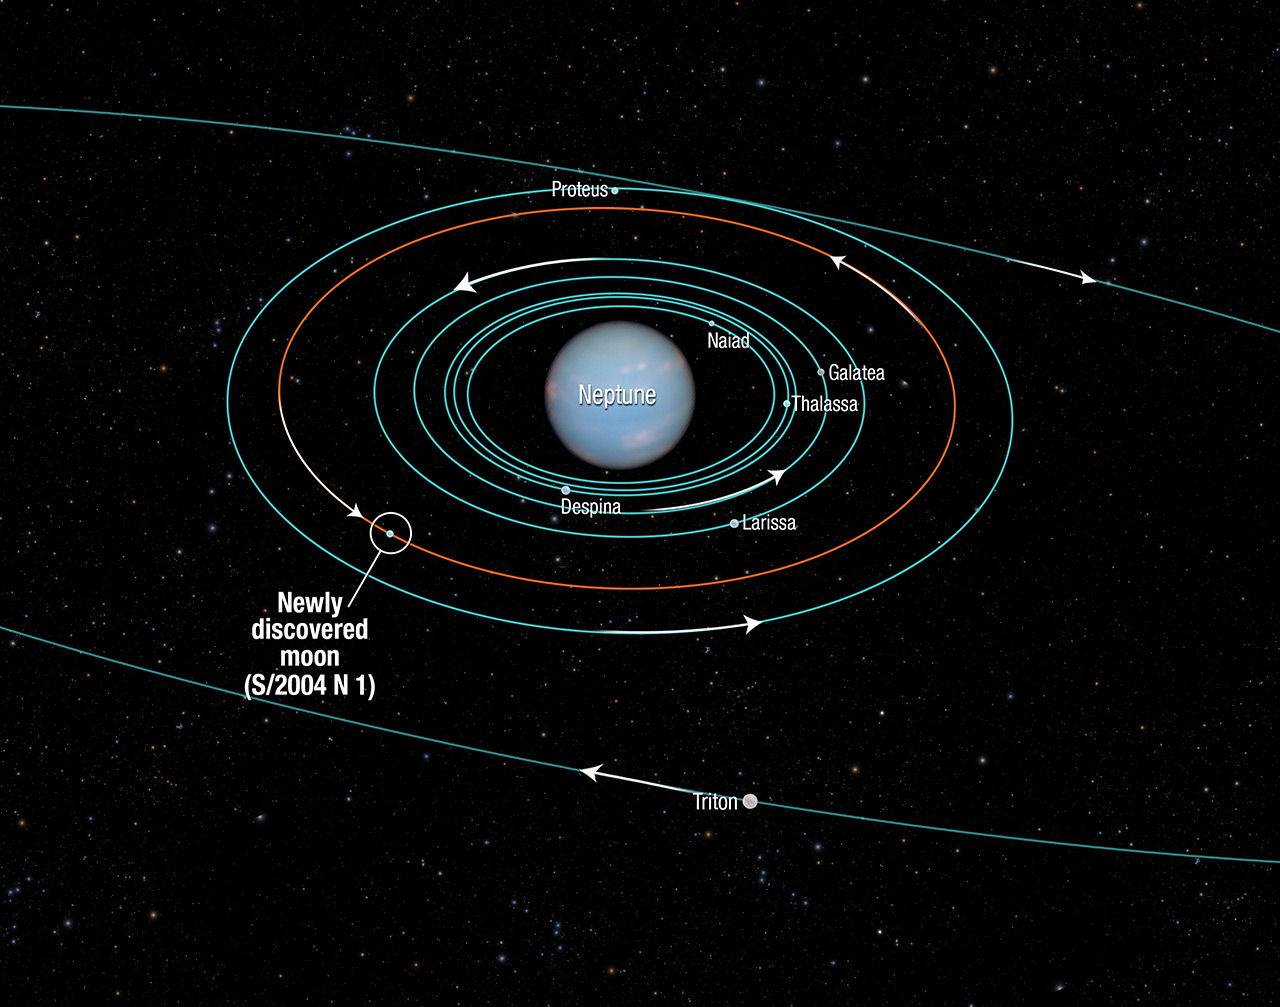 Neptune's Moons: 14 Discovered So Far